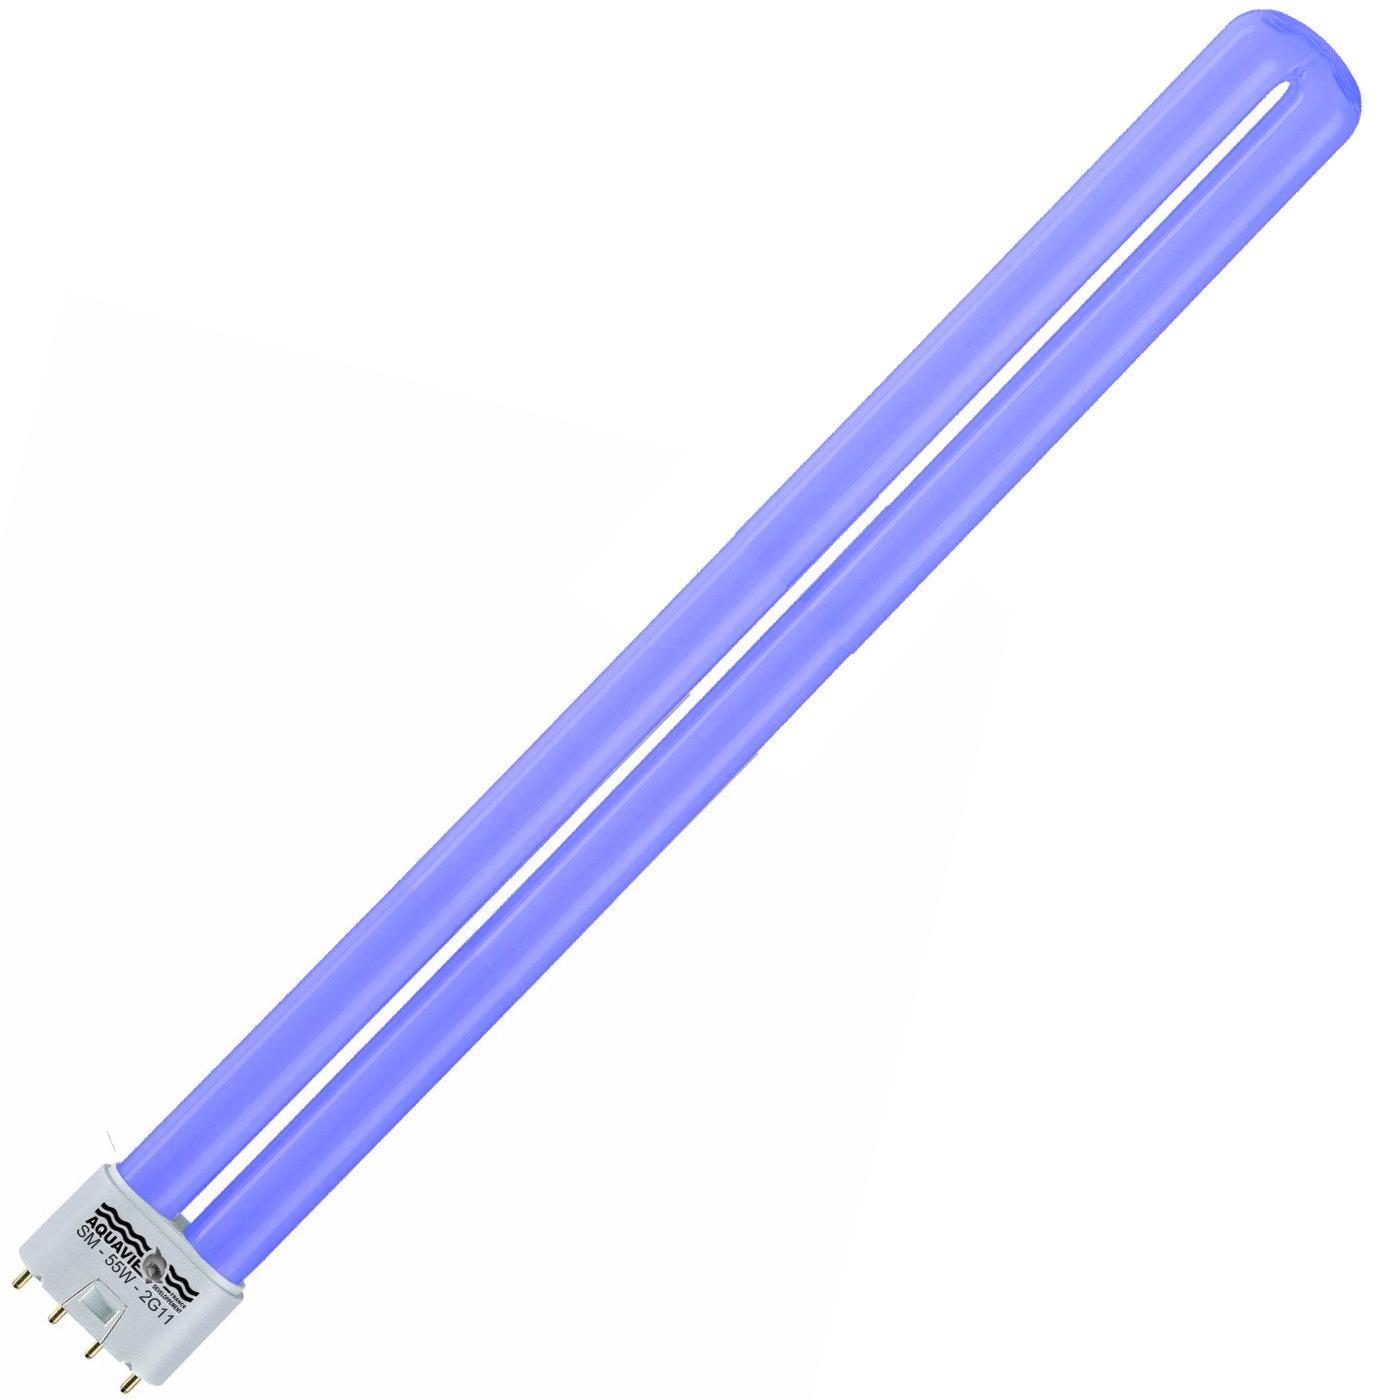 AQUAVIE Lumivie SM 55w bleu ampoule fluocompact culot 2G11